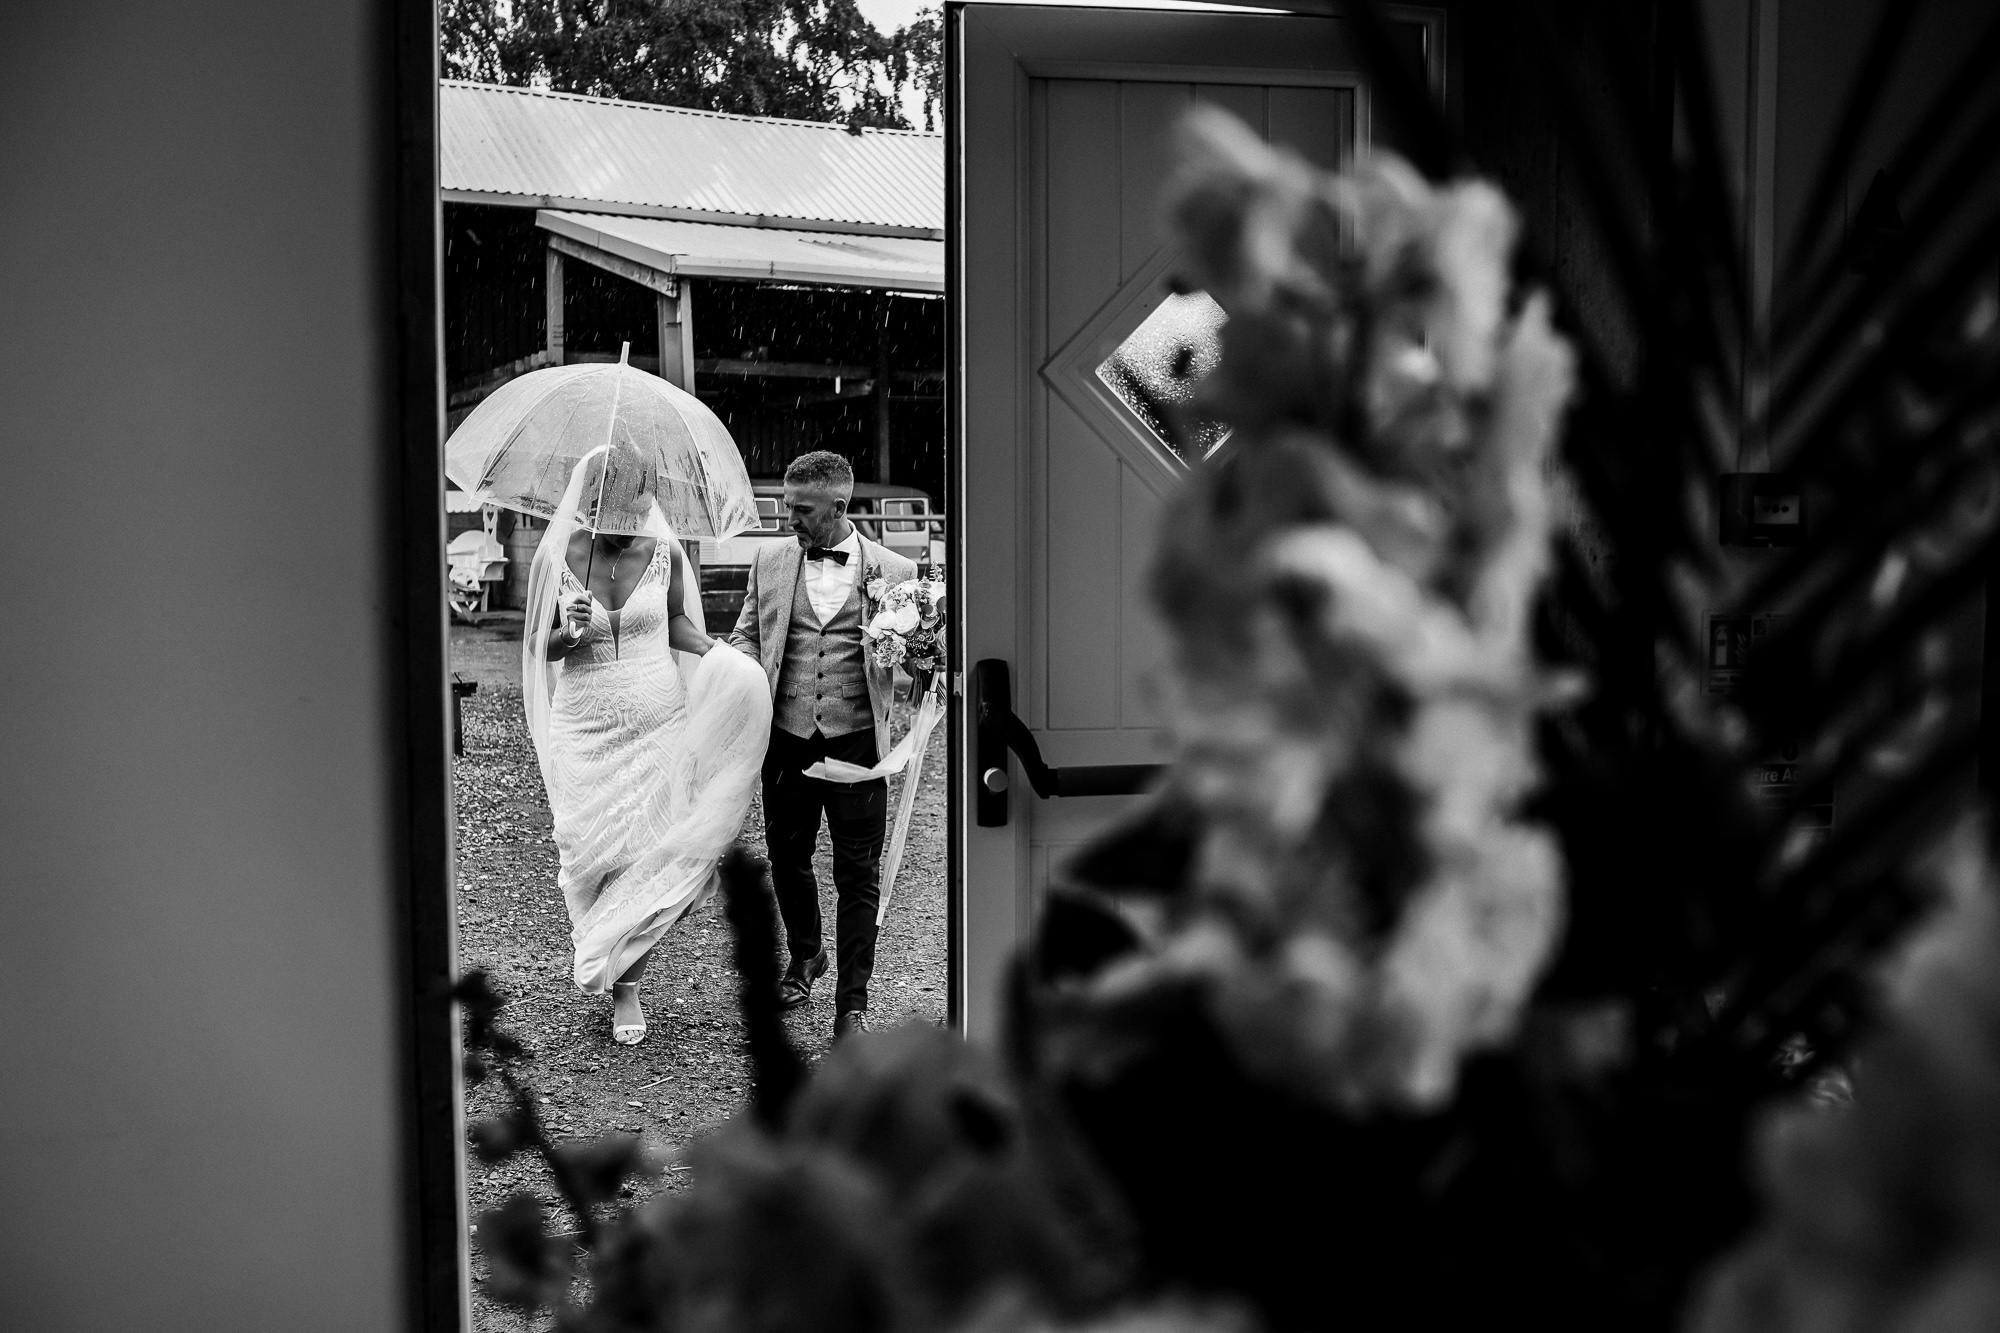 The Hayloft Wedding Photography Cheshire wedding photographer (36 of 52).jpg